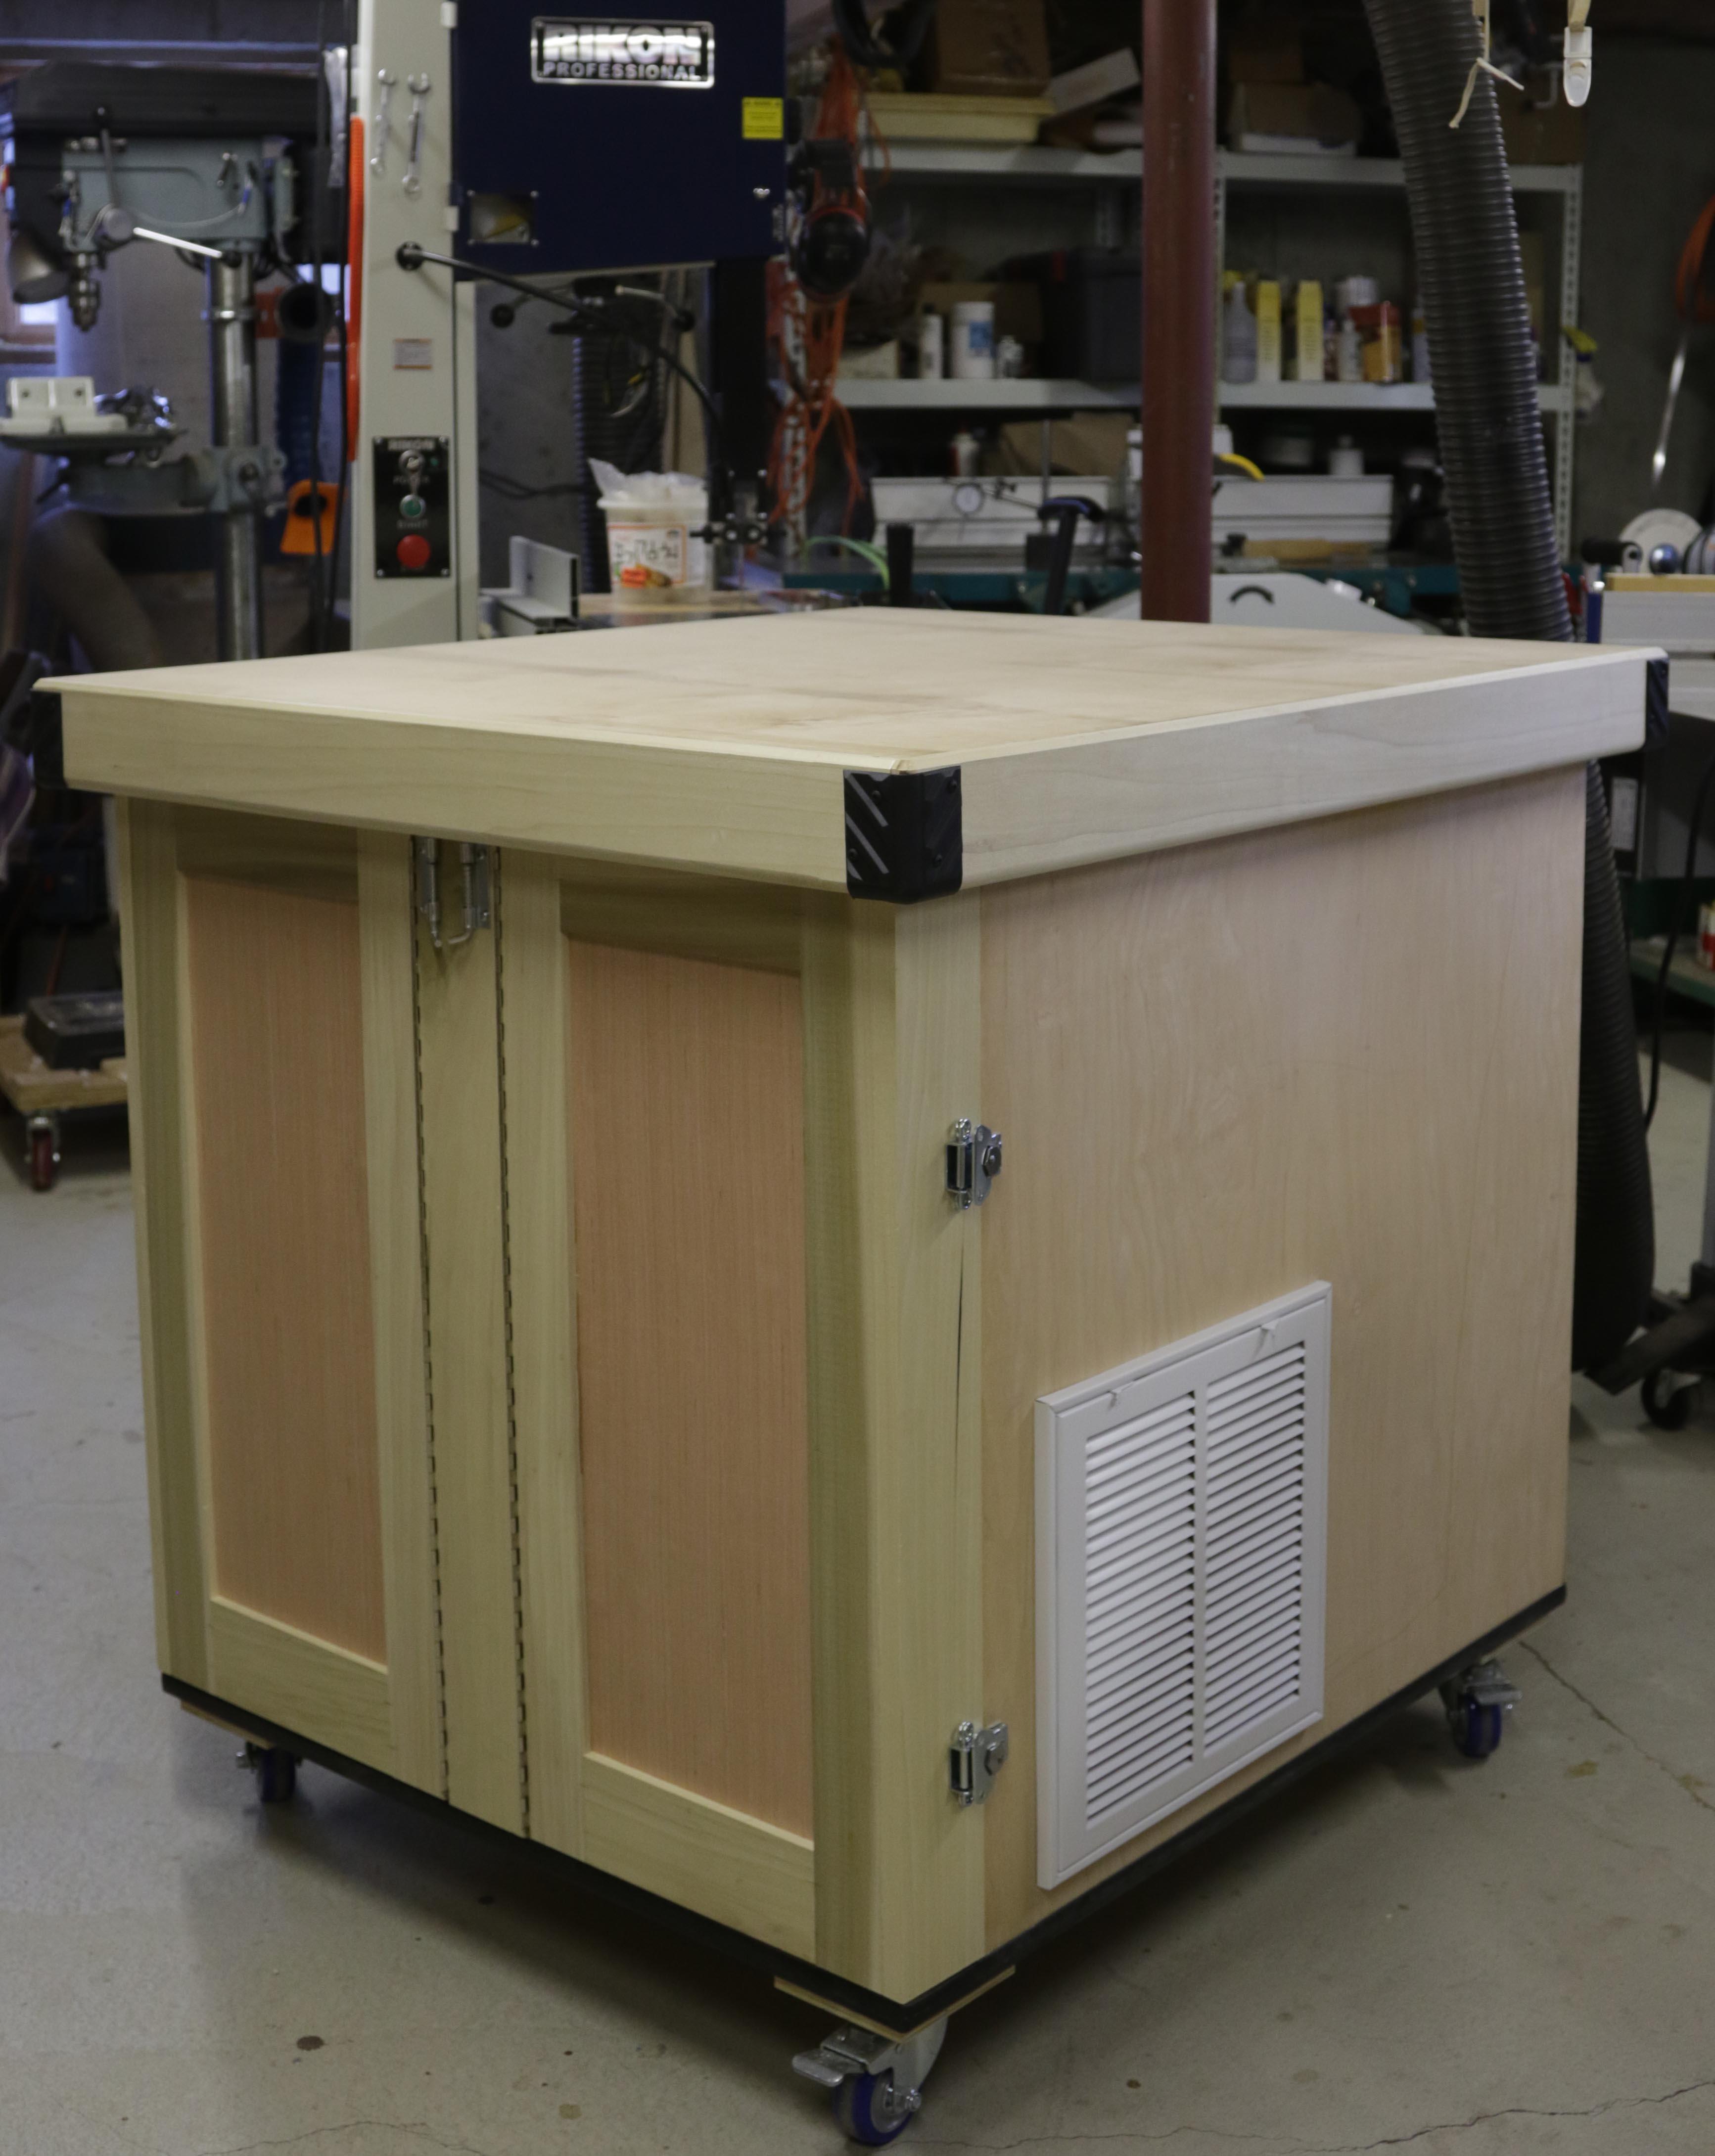 CNC Build Part 0: The Base « Adafruit Industries – Makers, hackers ...